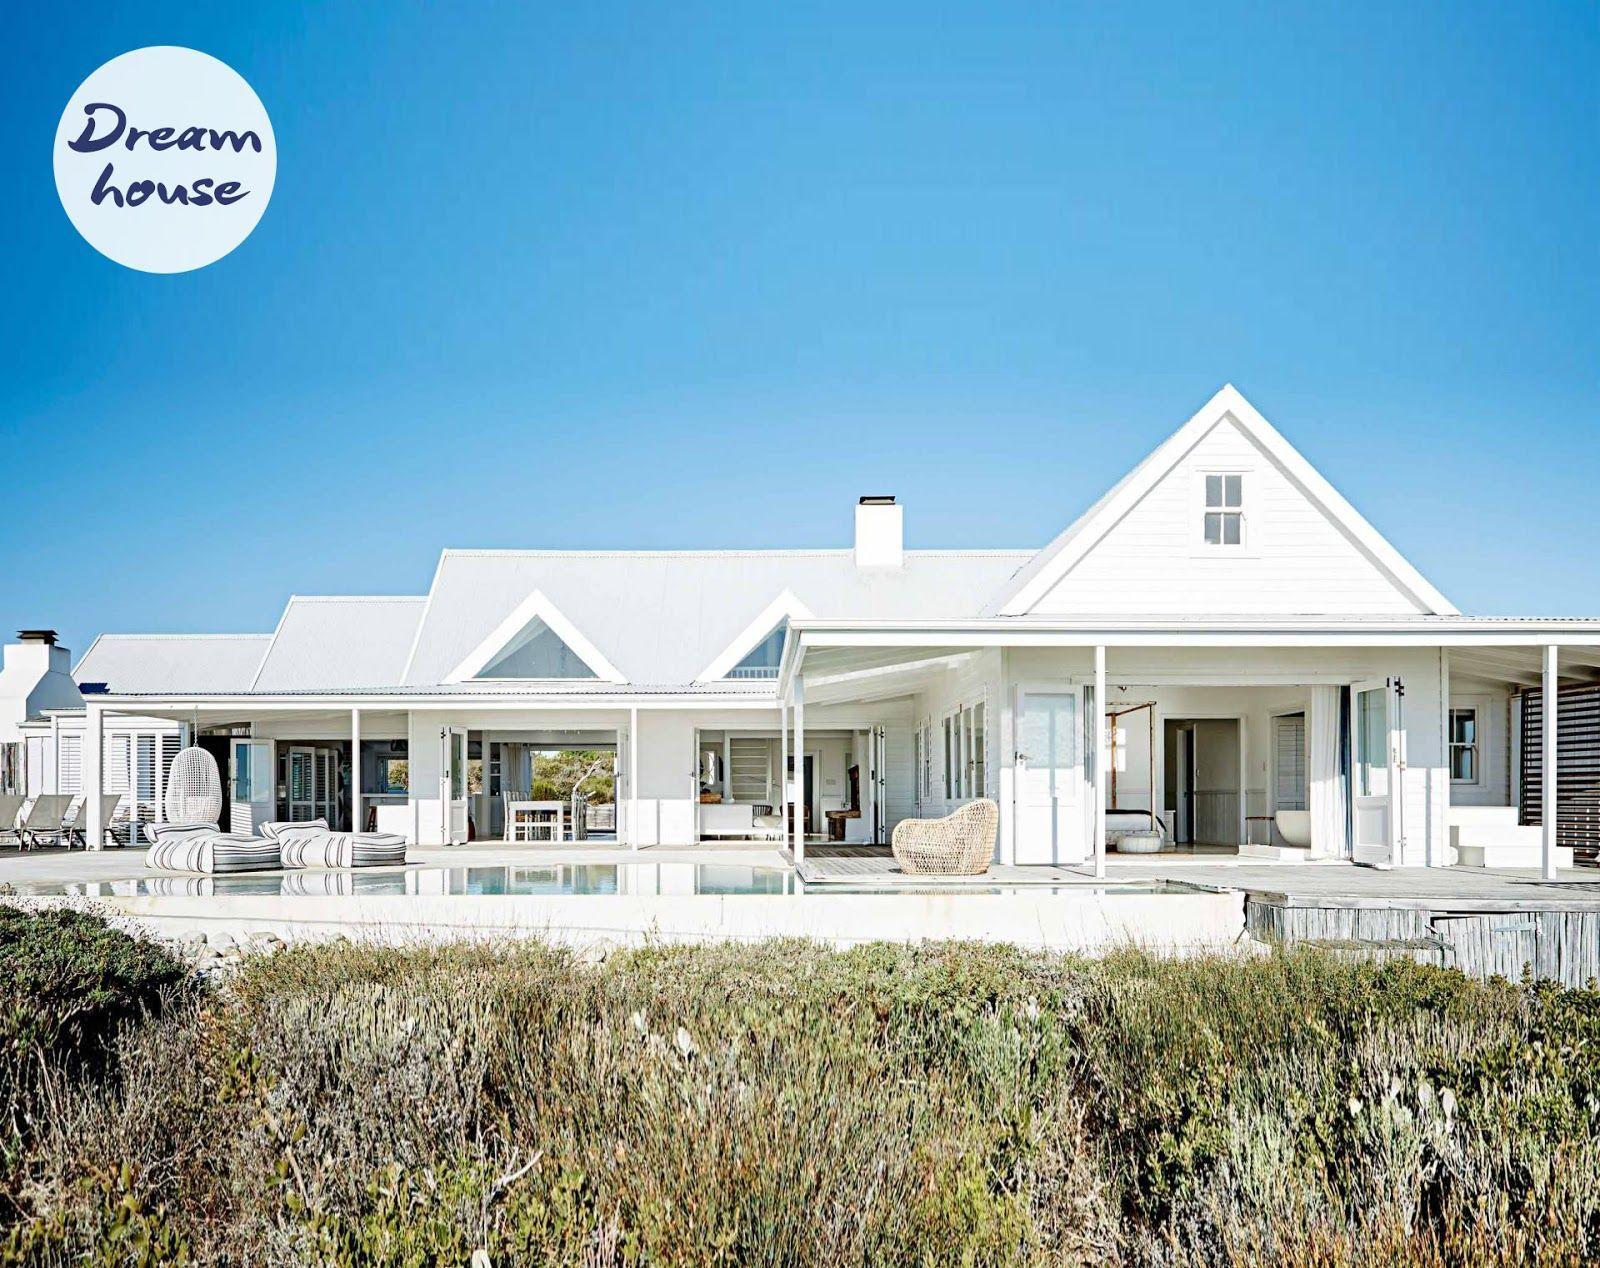 19 Dazzling Coastal Decor Small Space Ideas Contemporary Beach House Beach House Design White Beach Houses